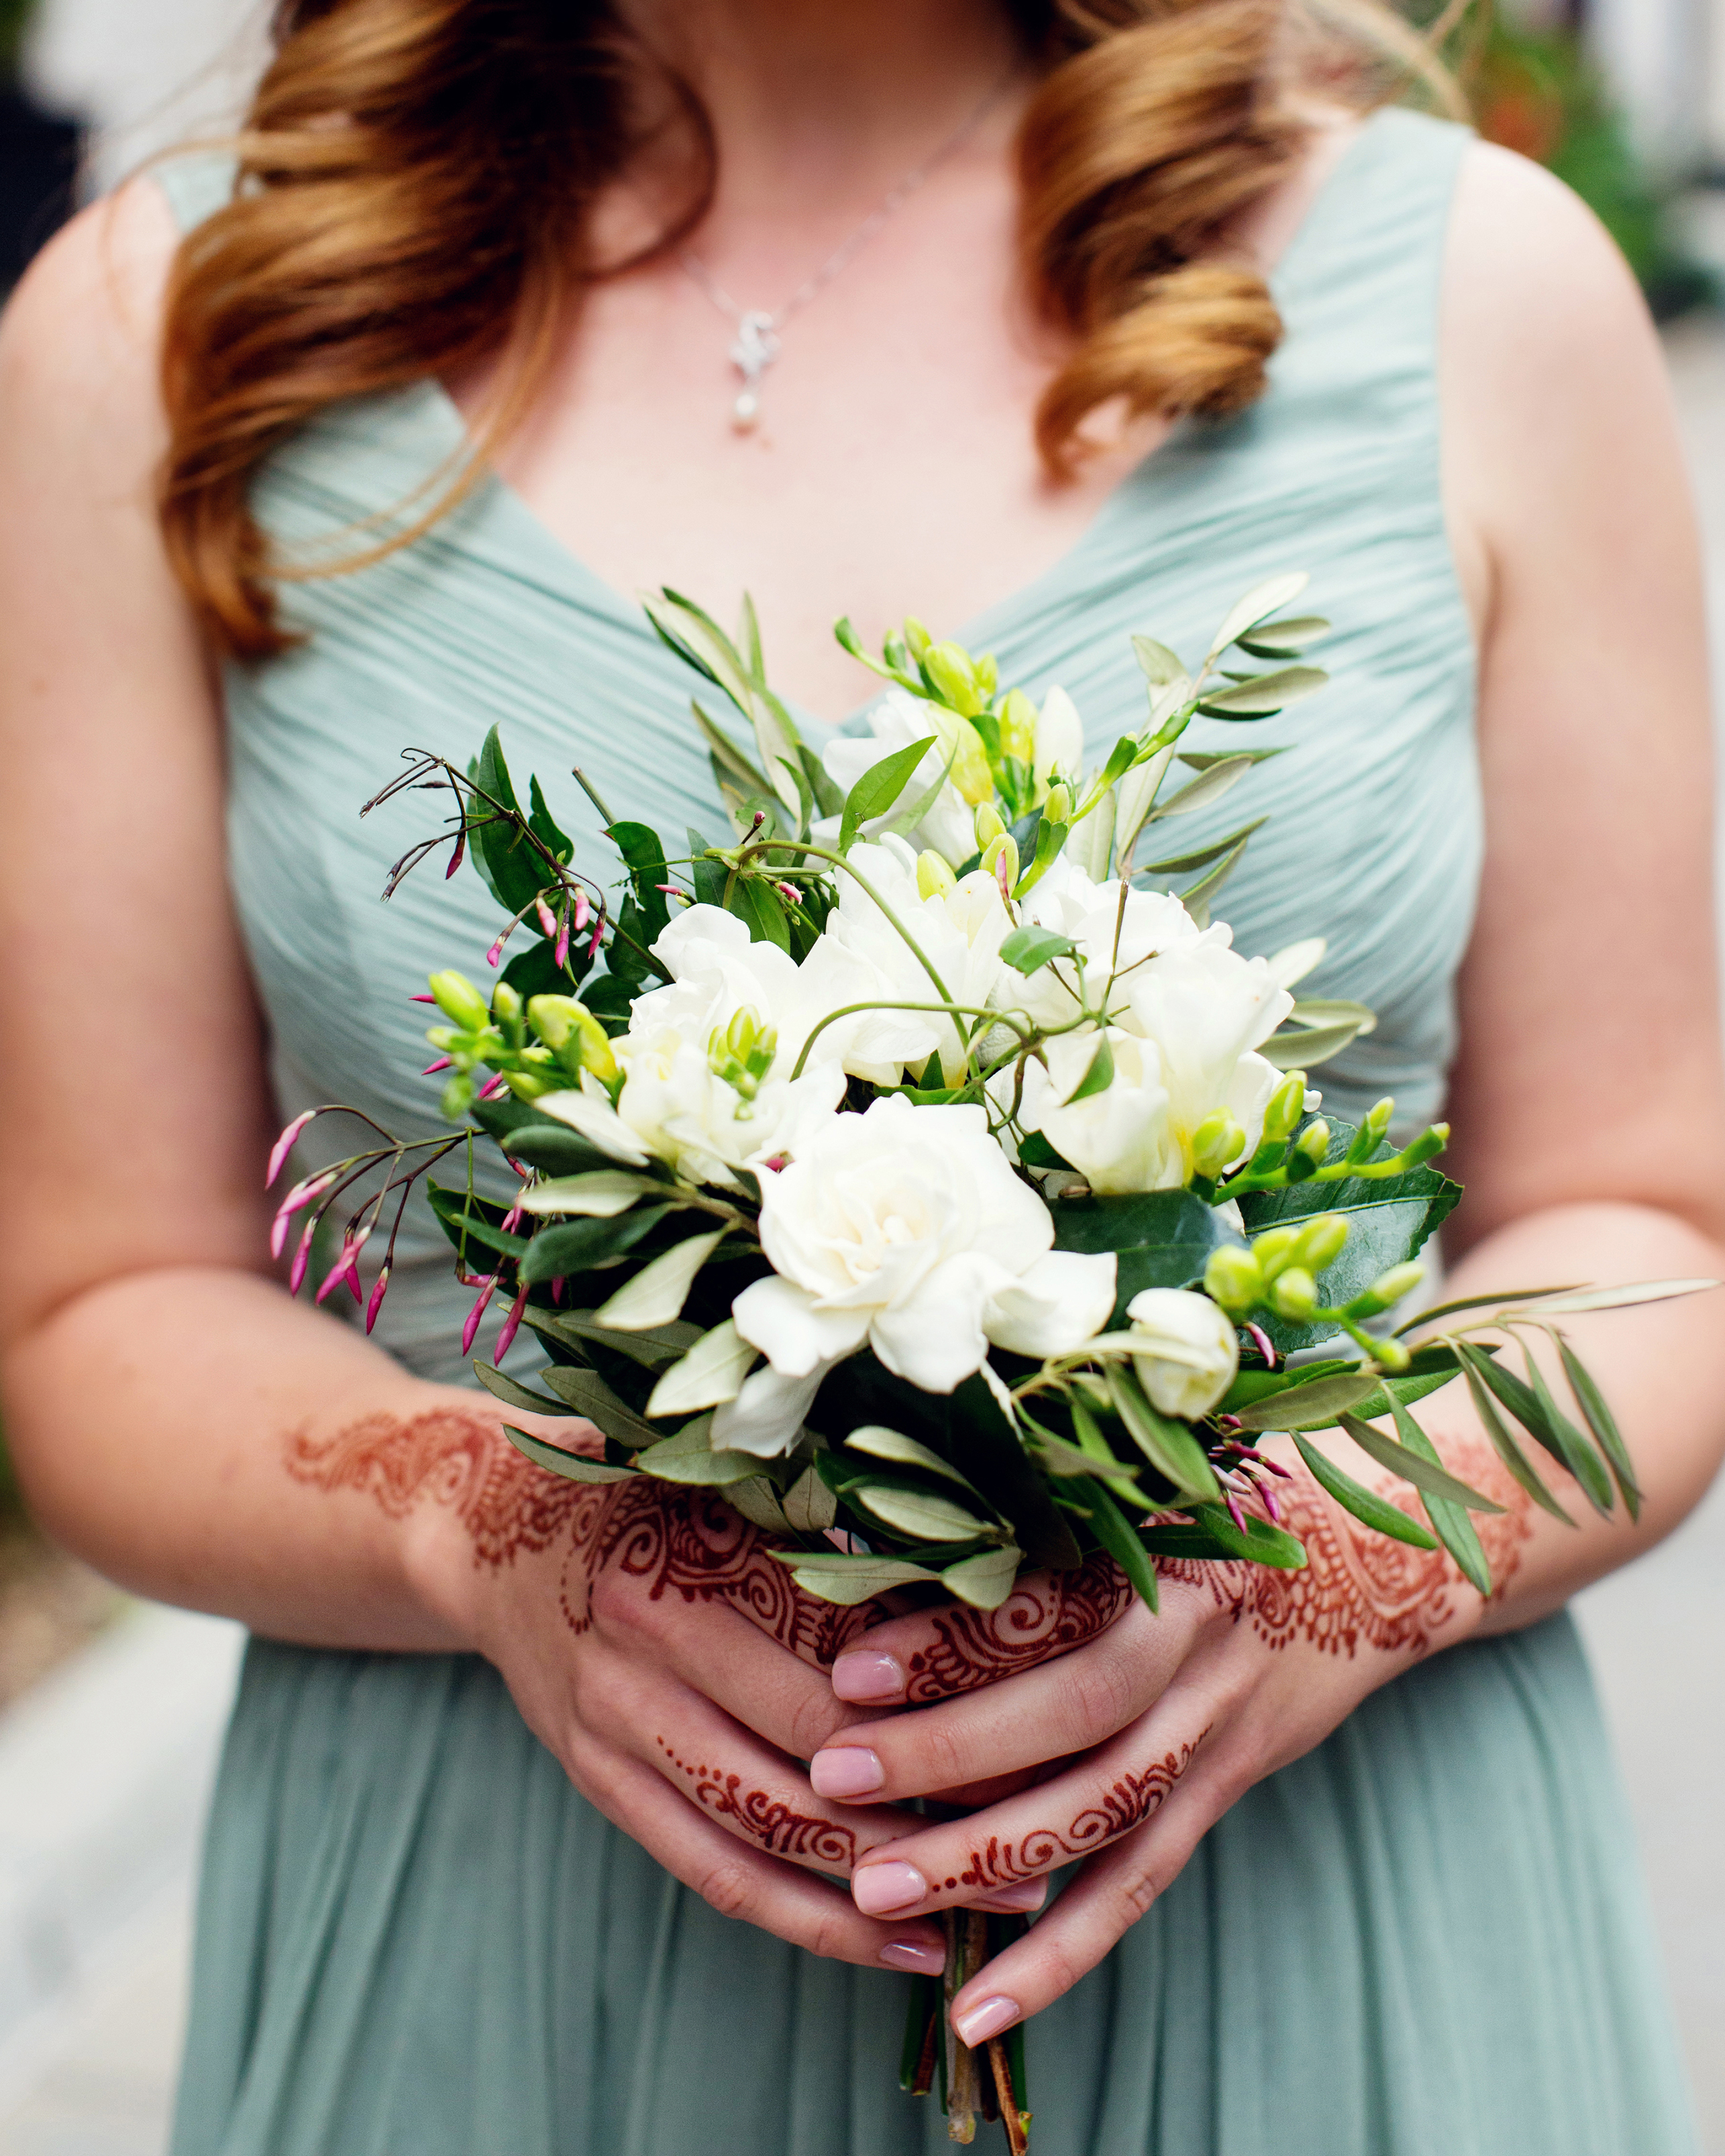 aiasha-charles-wedding-bouquet2-0514.jpg